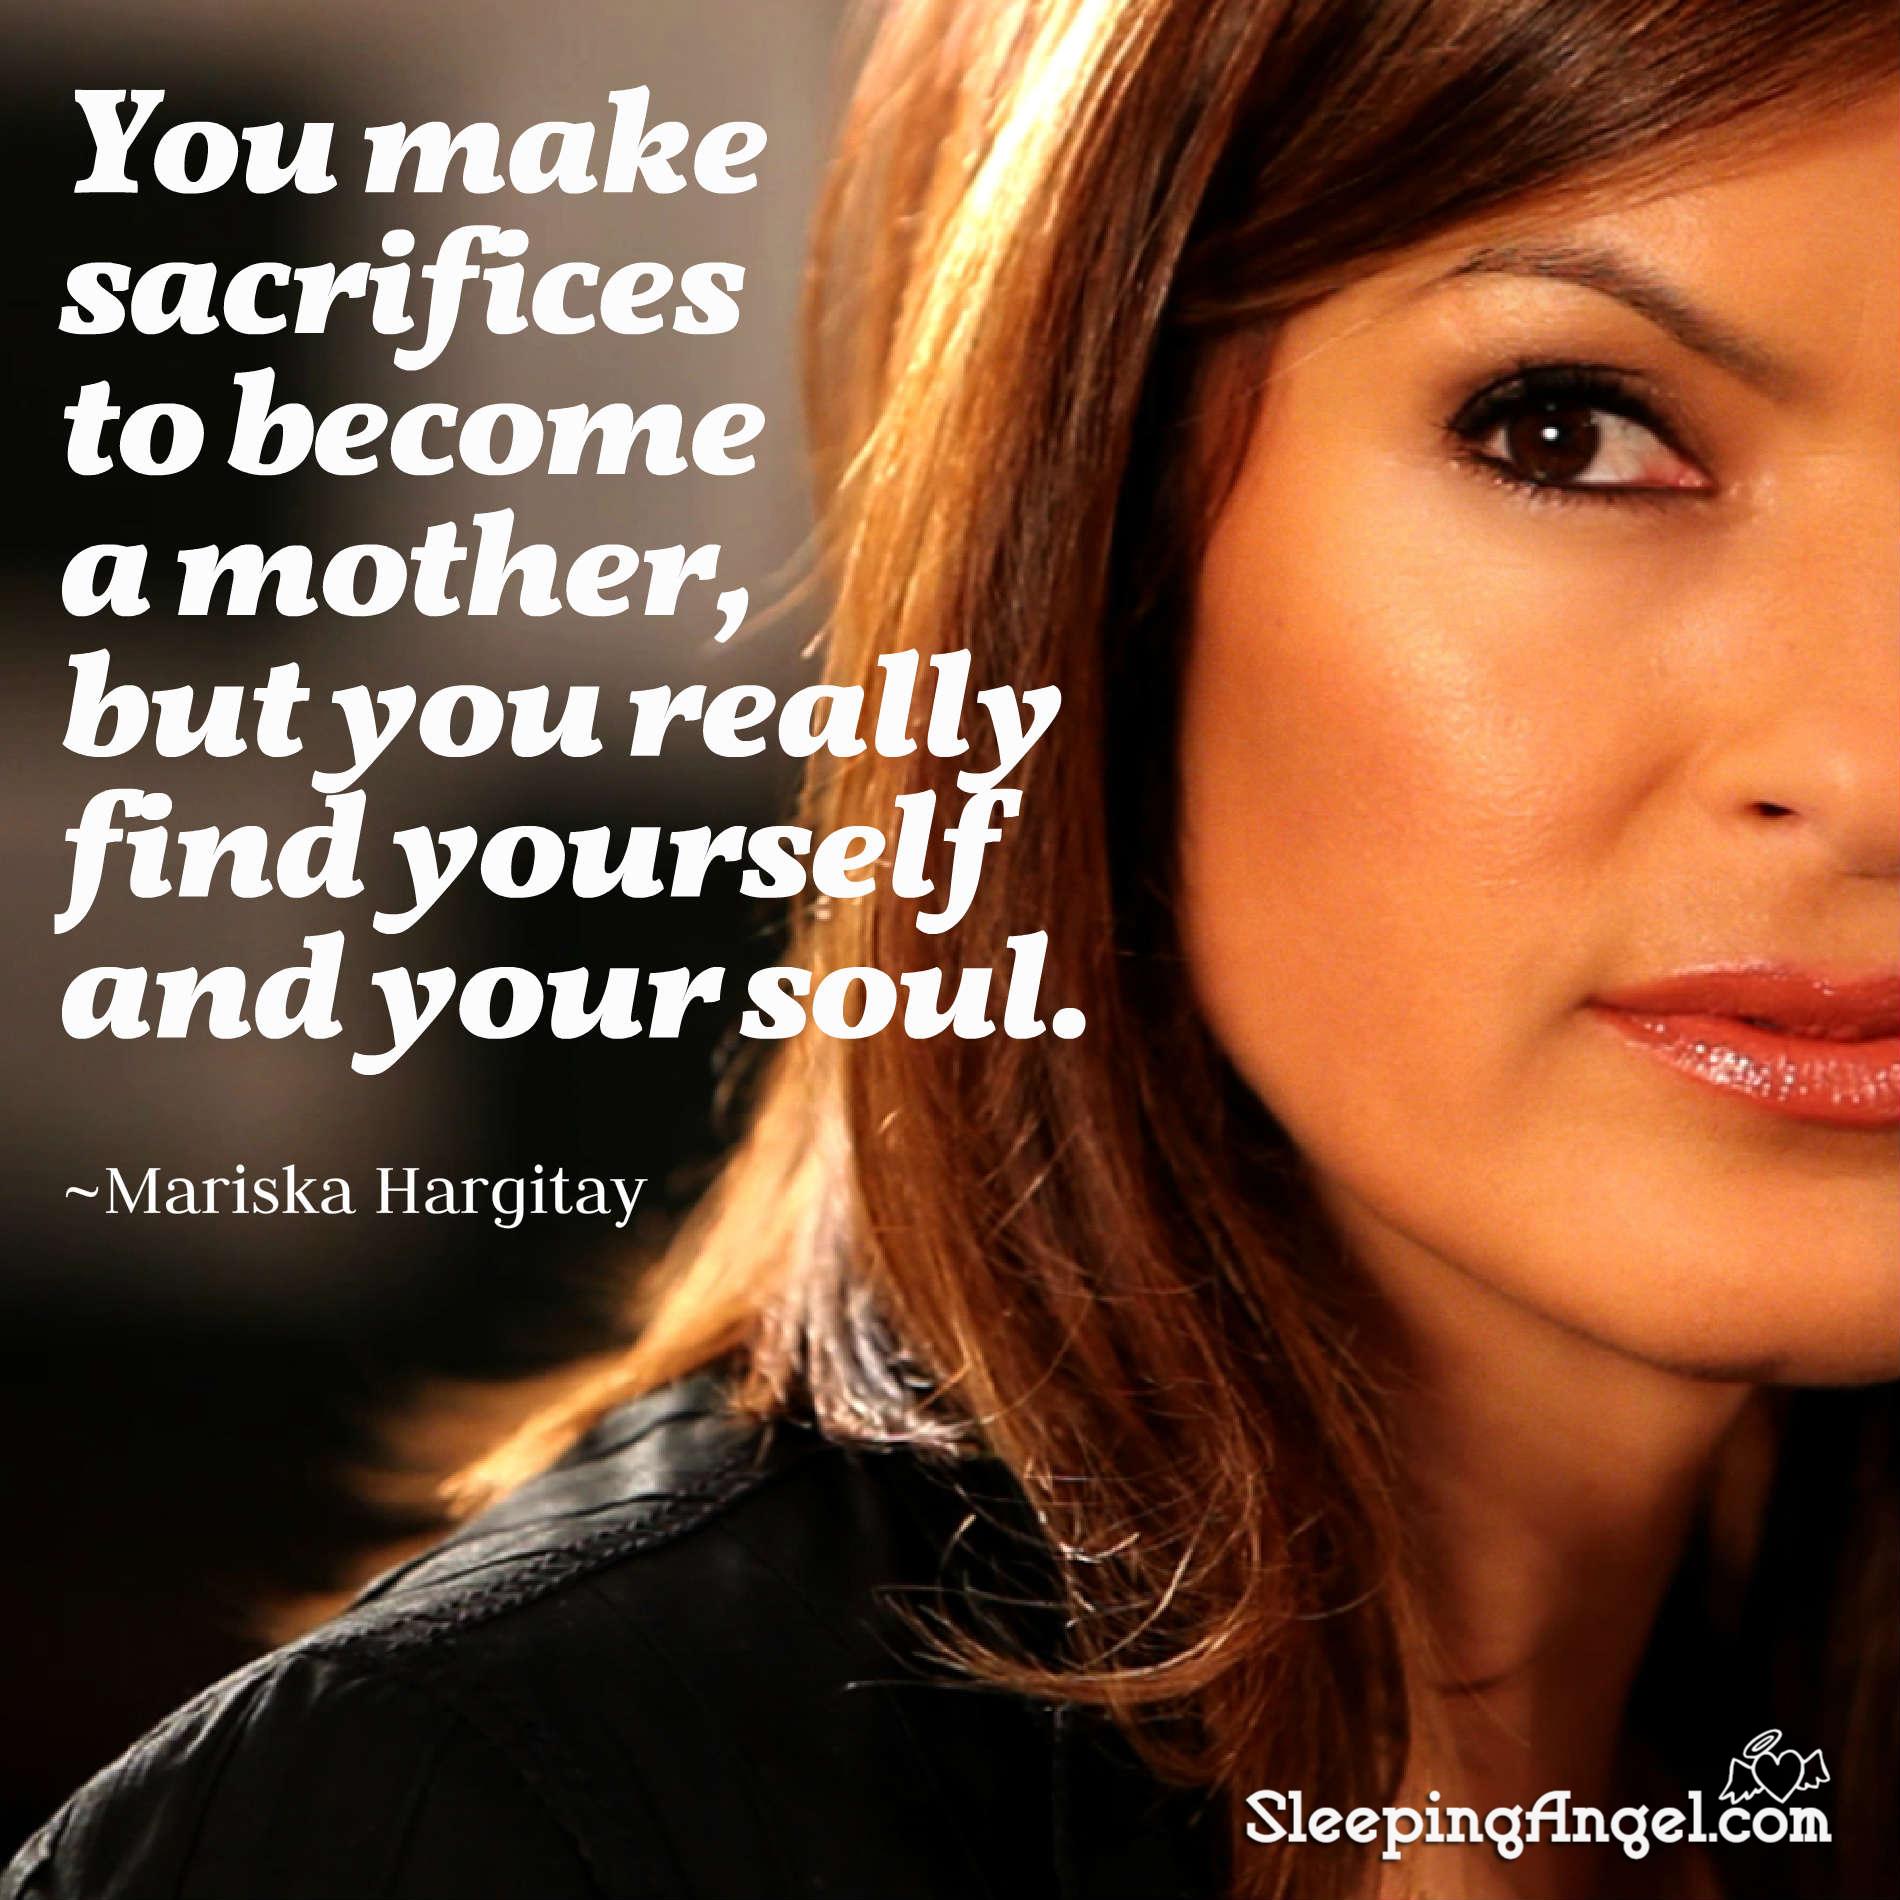 Mariska Hargitay Quote